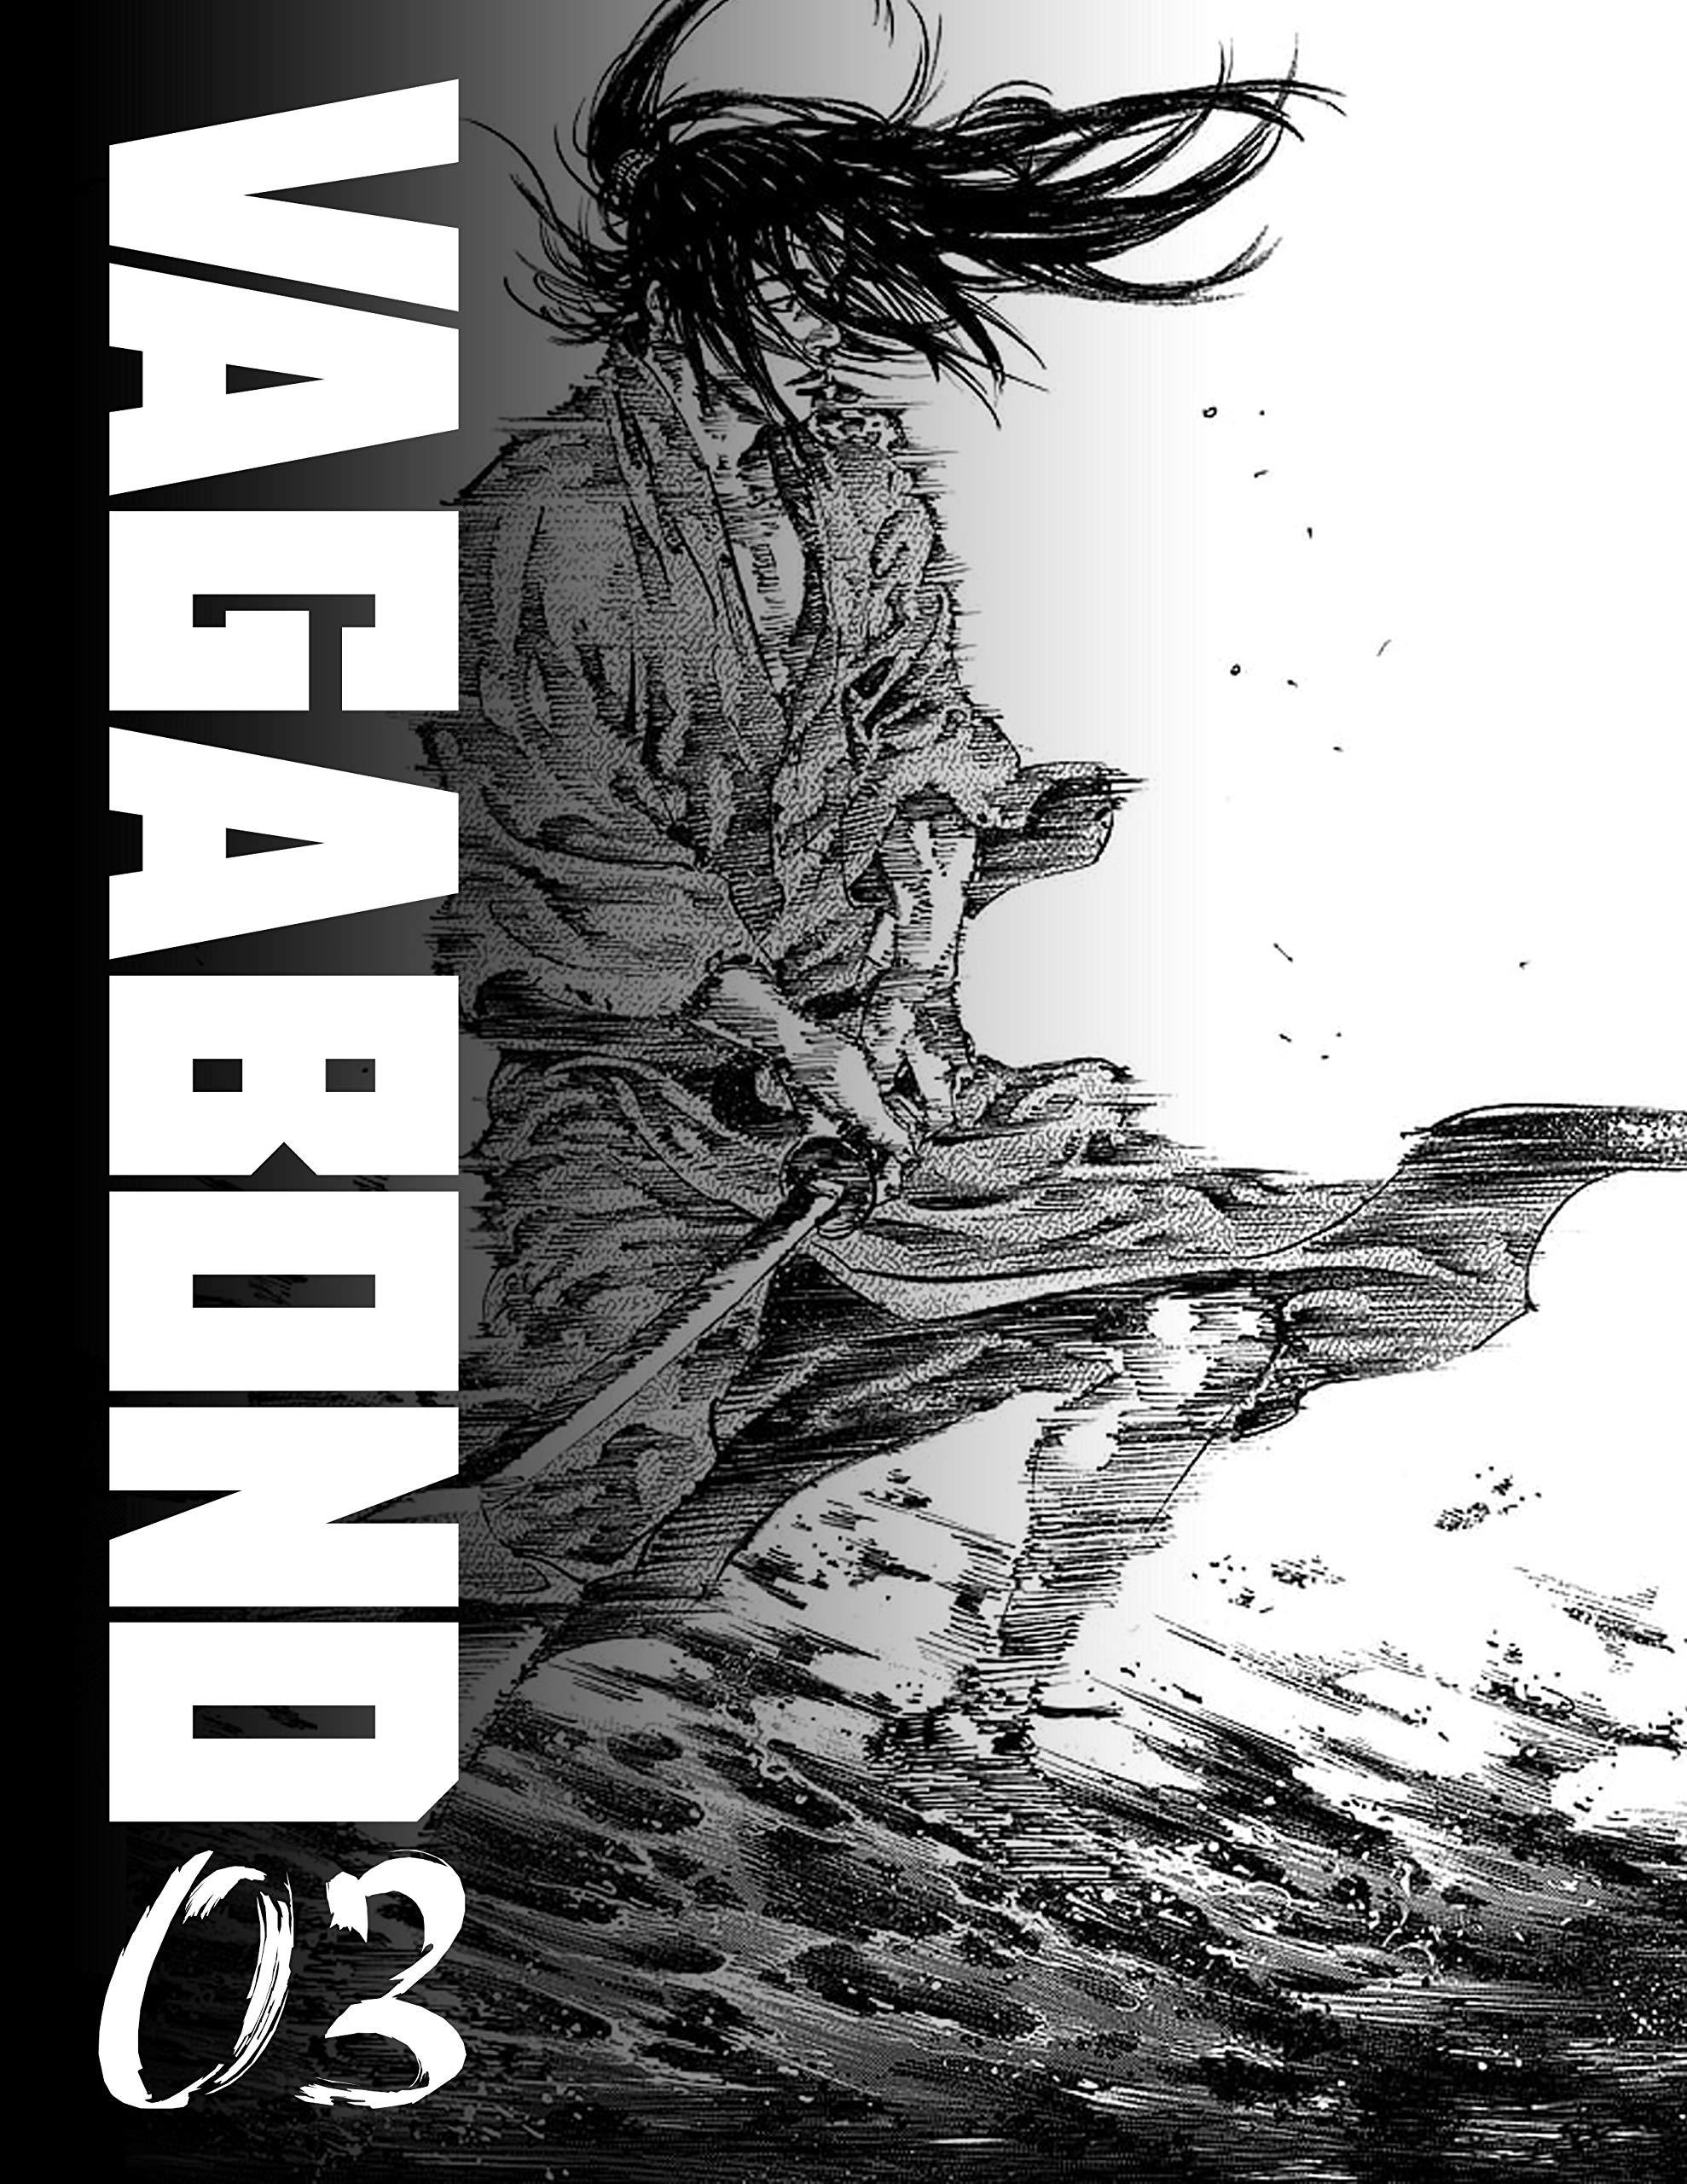 Vagabond: manga books Box Set Omnibus Vol 3 full | For Epic, Historical Fiction, Martial Arts FAN